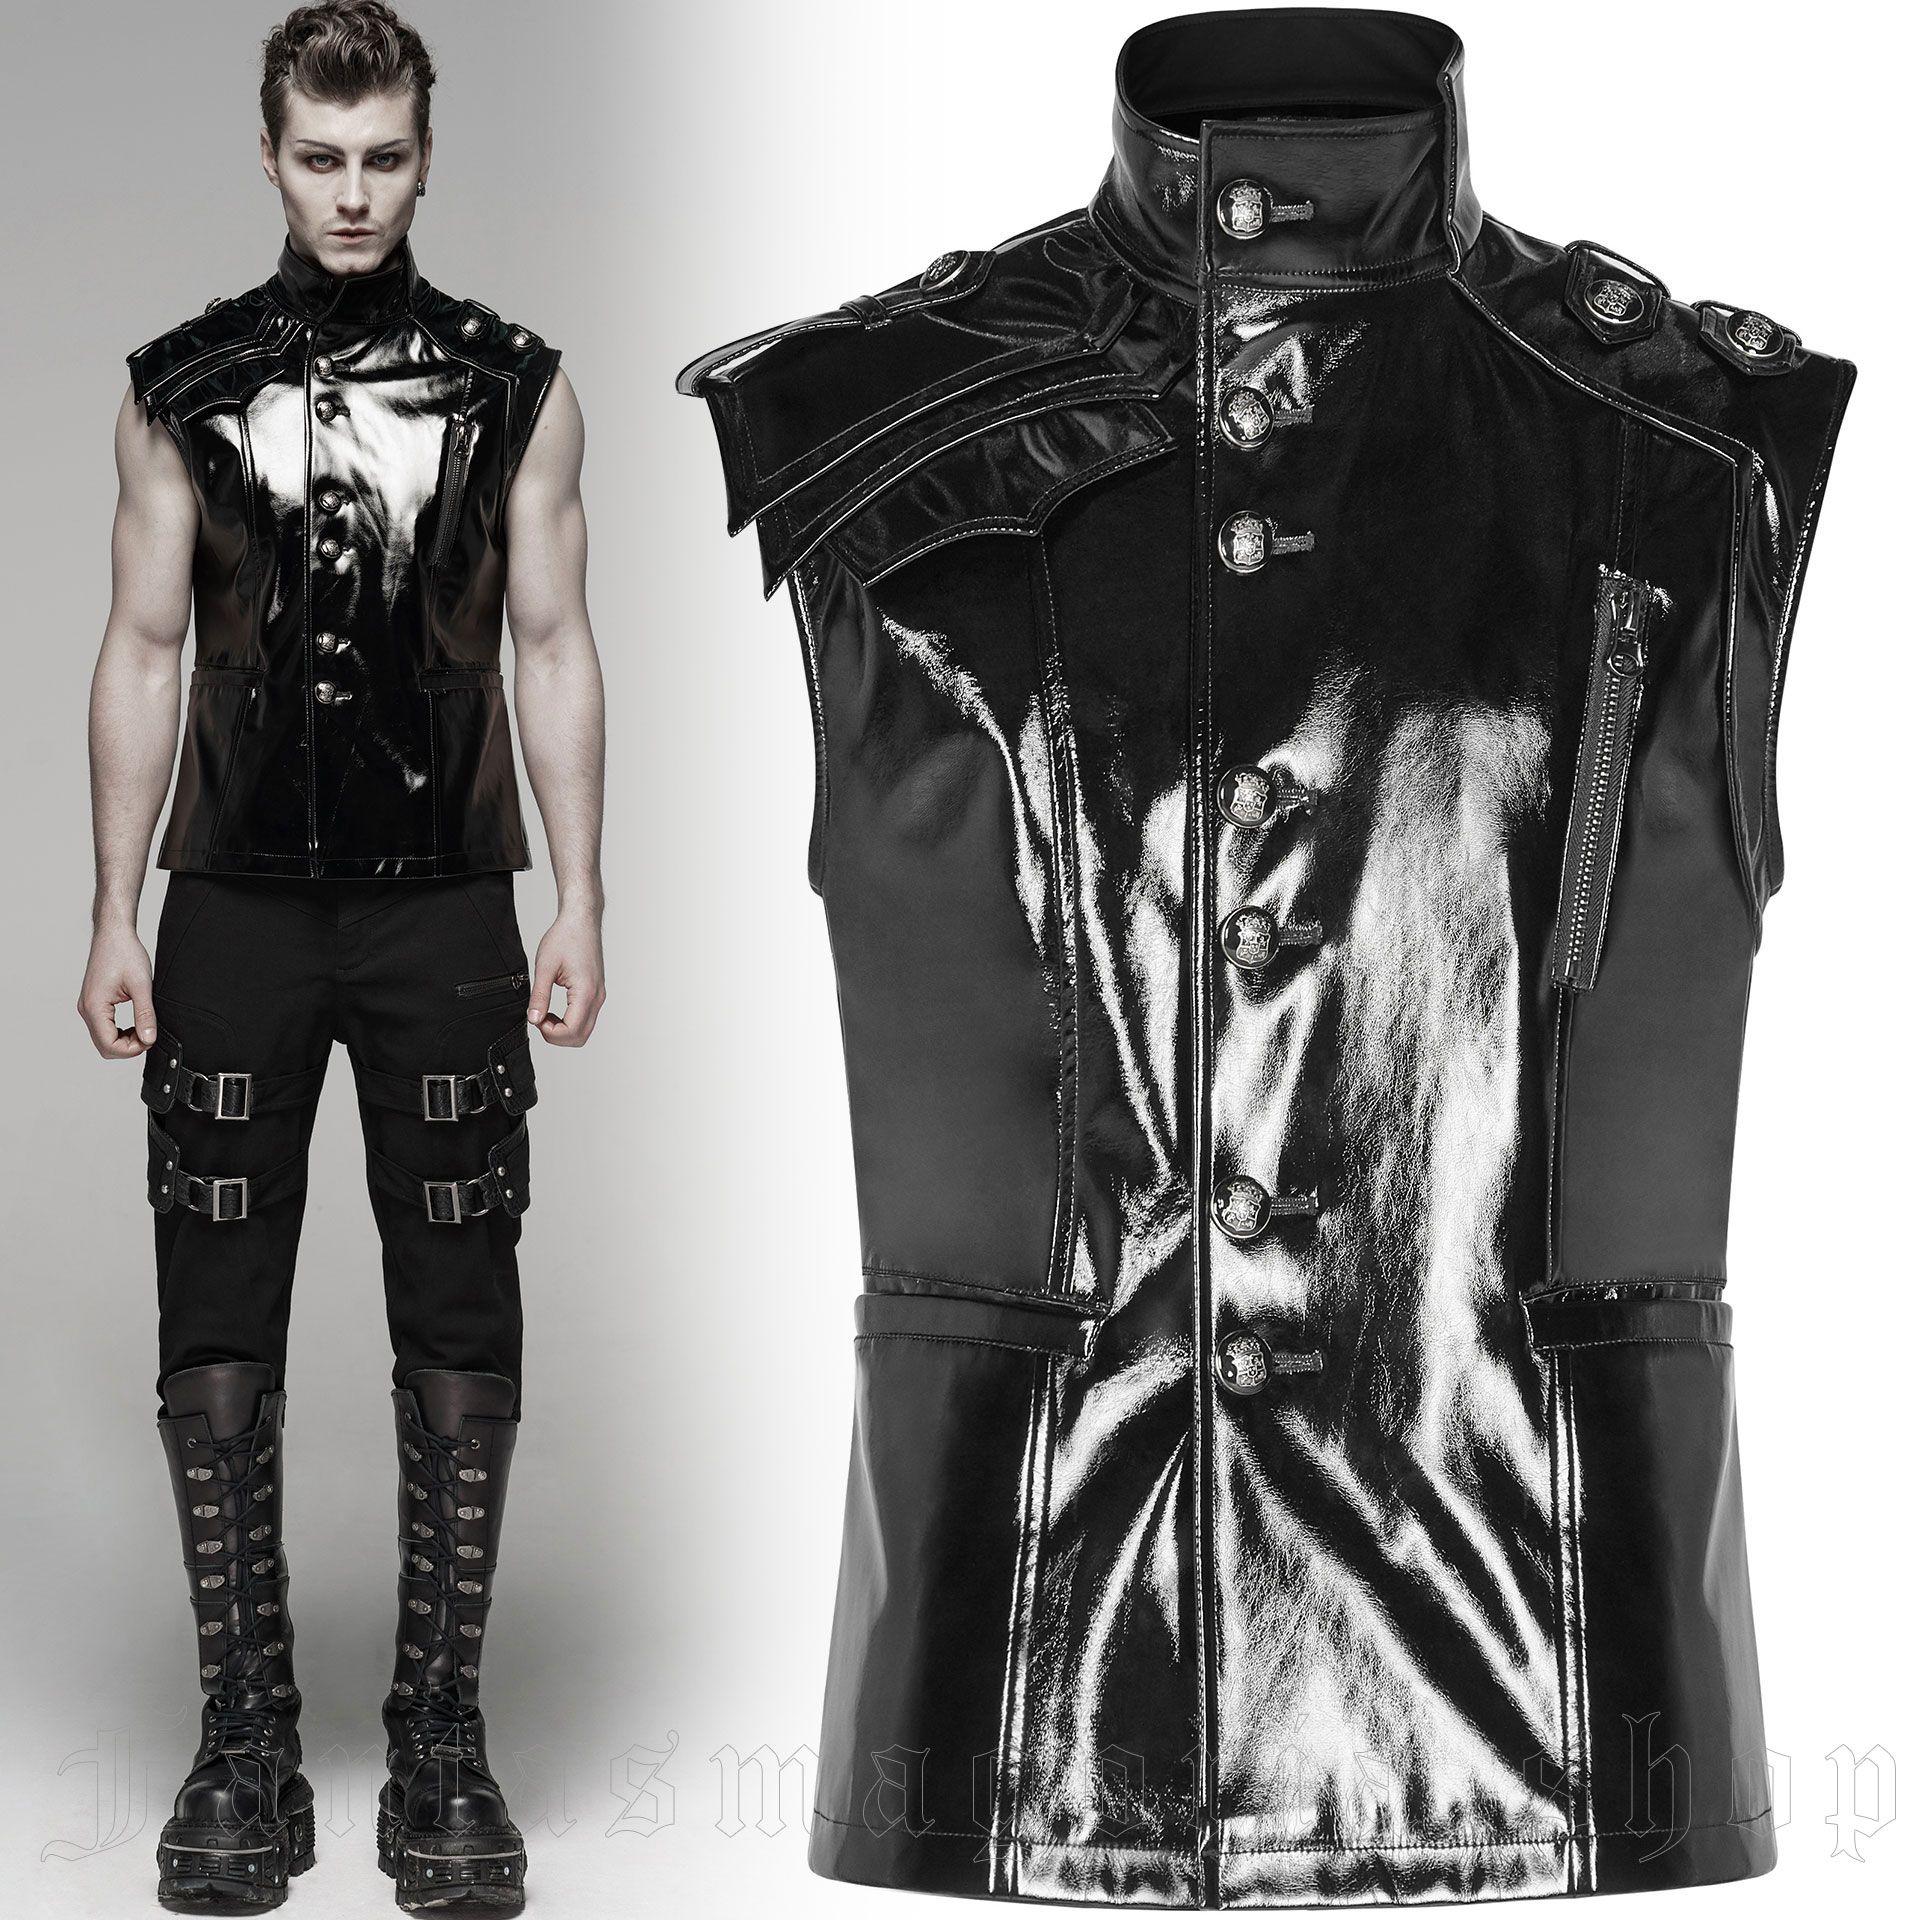 men's Mesmerizer Vest by PUNK RAVE brand, code: WY-1080